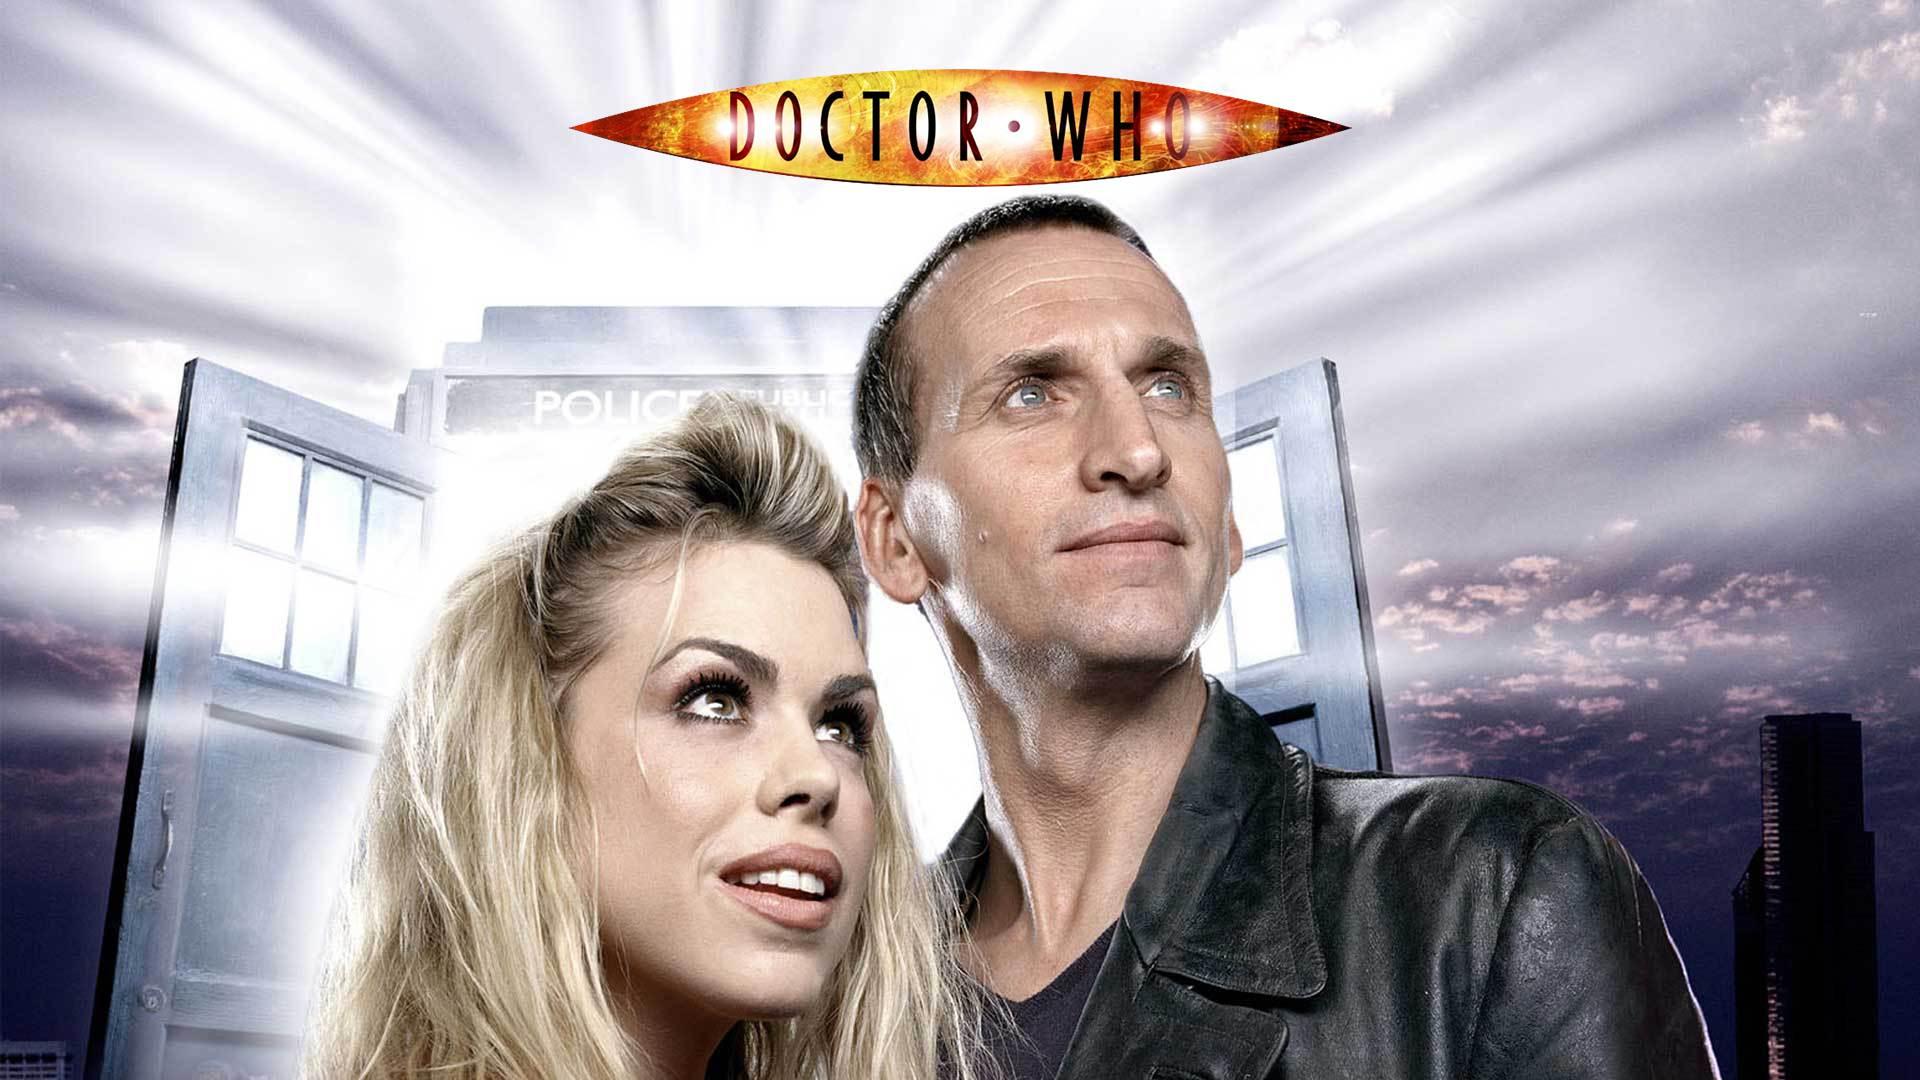 Doctor Who Season 1